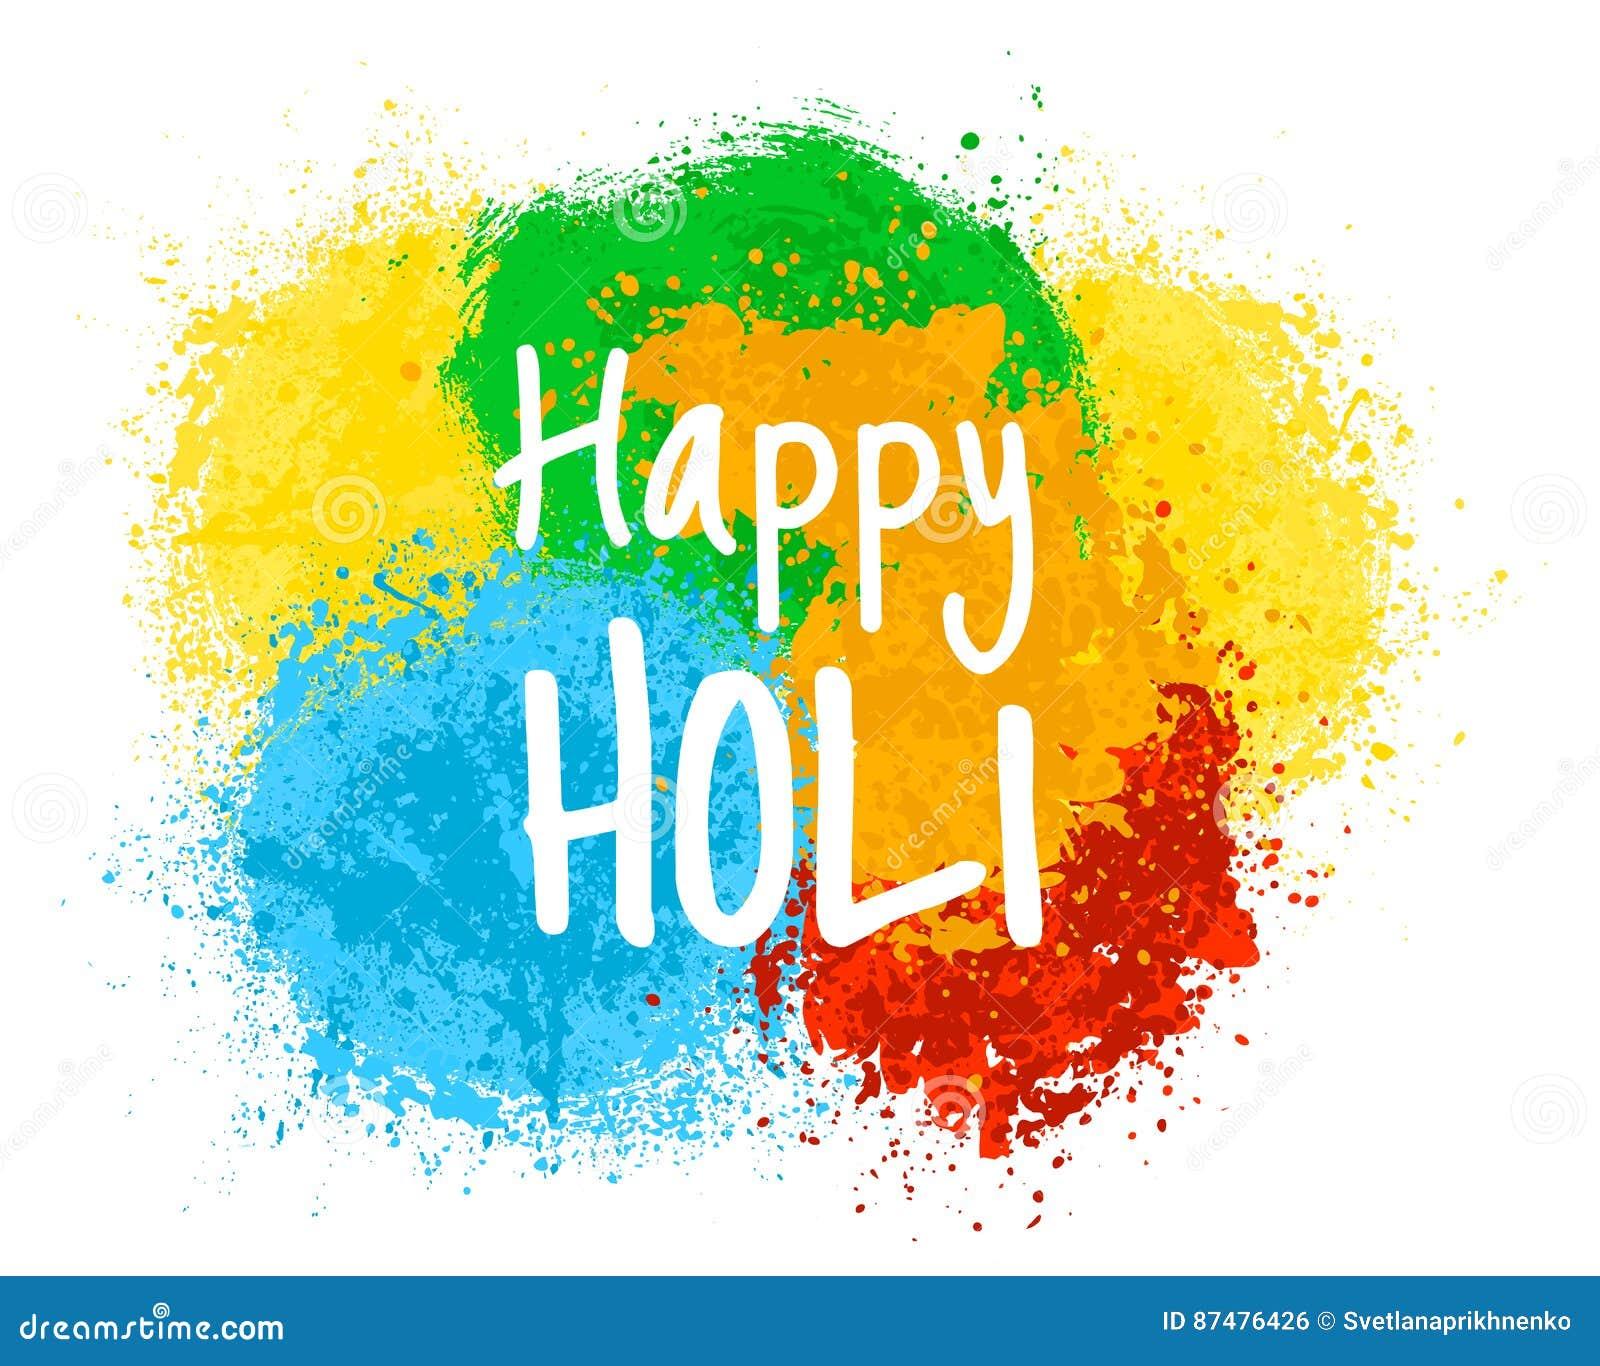 Индийский праздник Holi